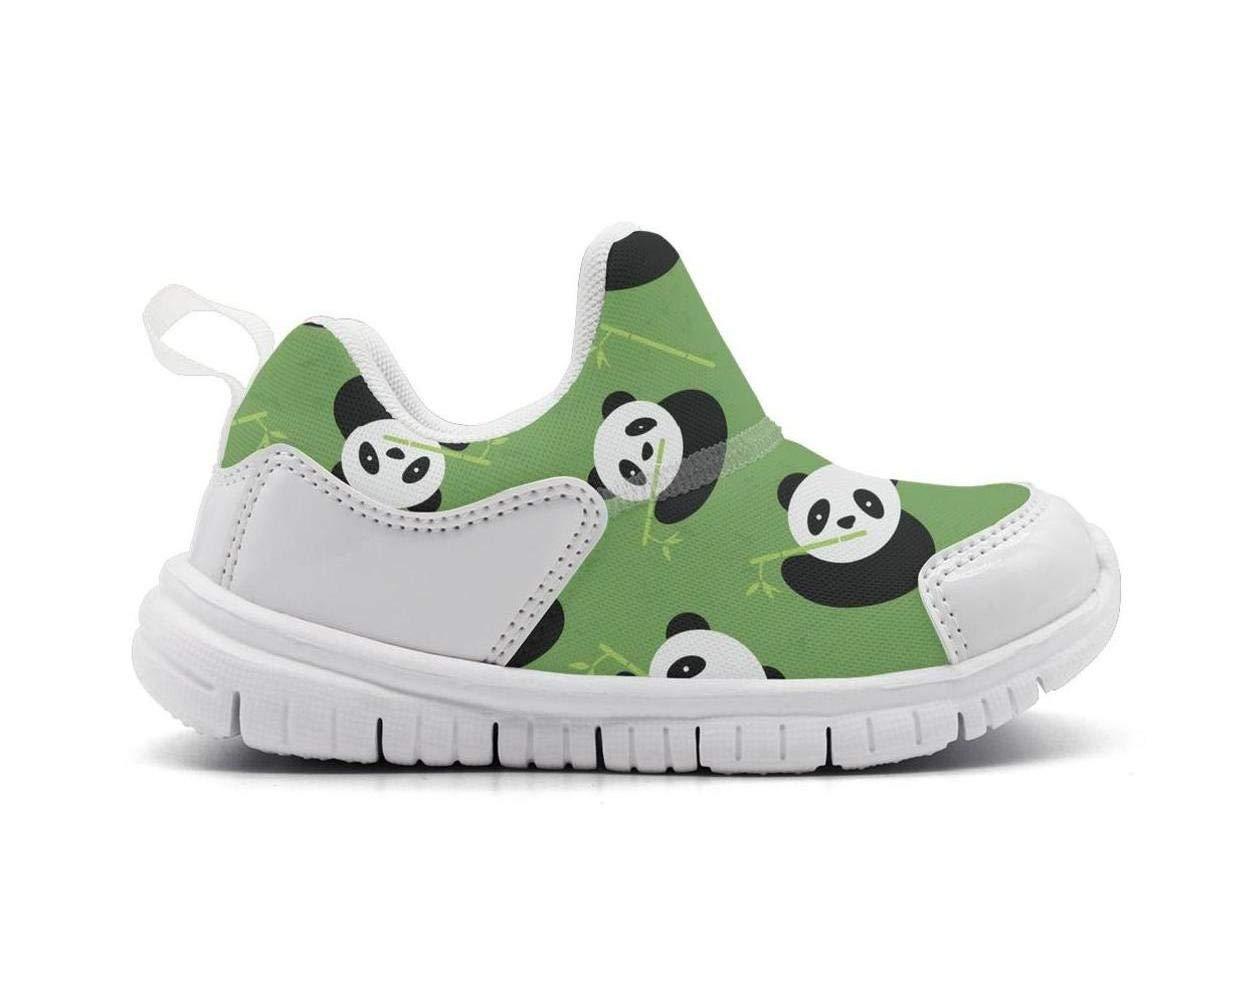 ONEYUAN Children Green Bamboo Panda Bear Baby Kid Casual Lightweight Sport Shoes Sneakers Running Shoes